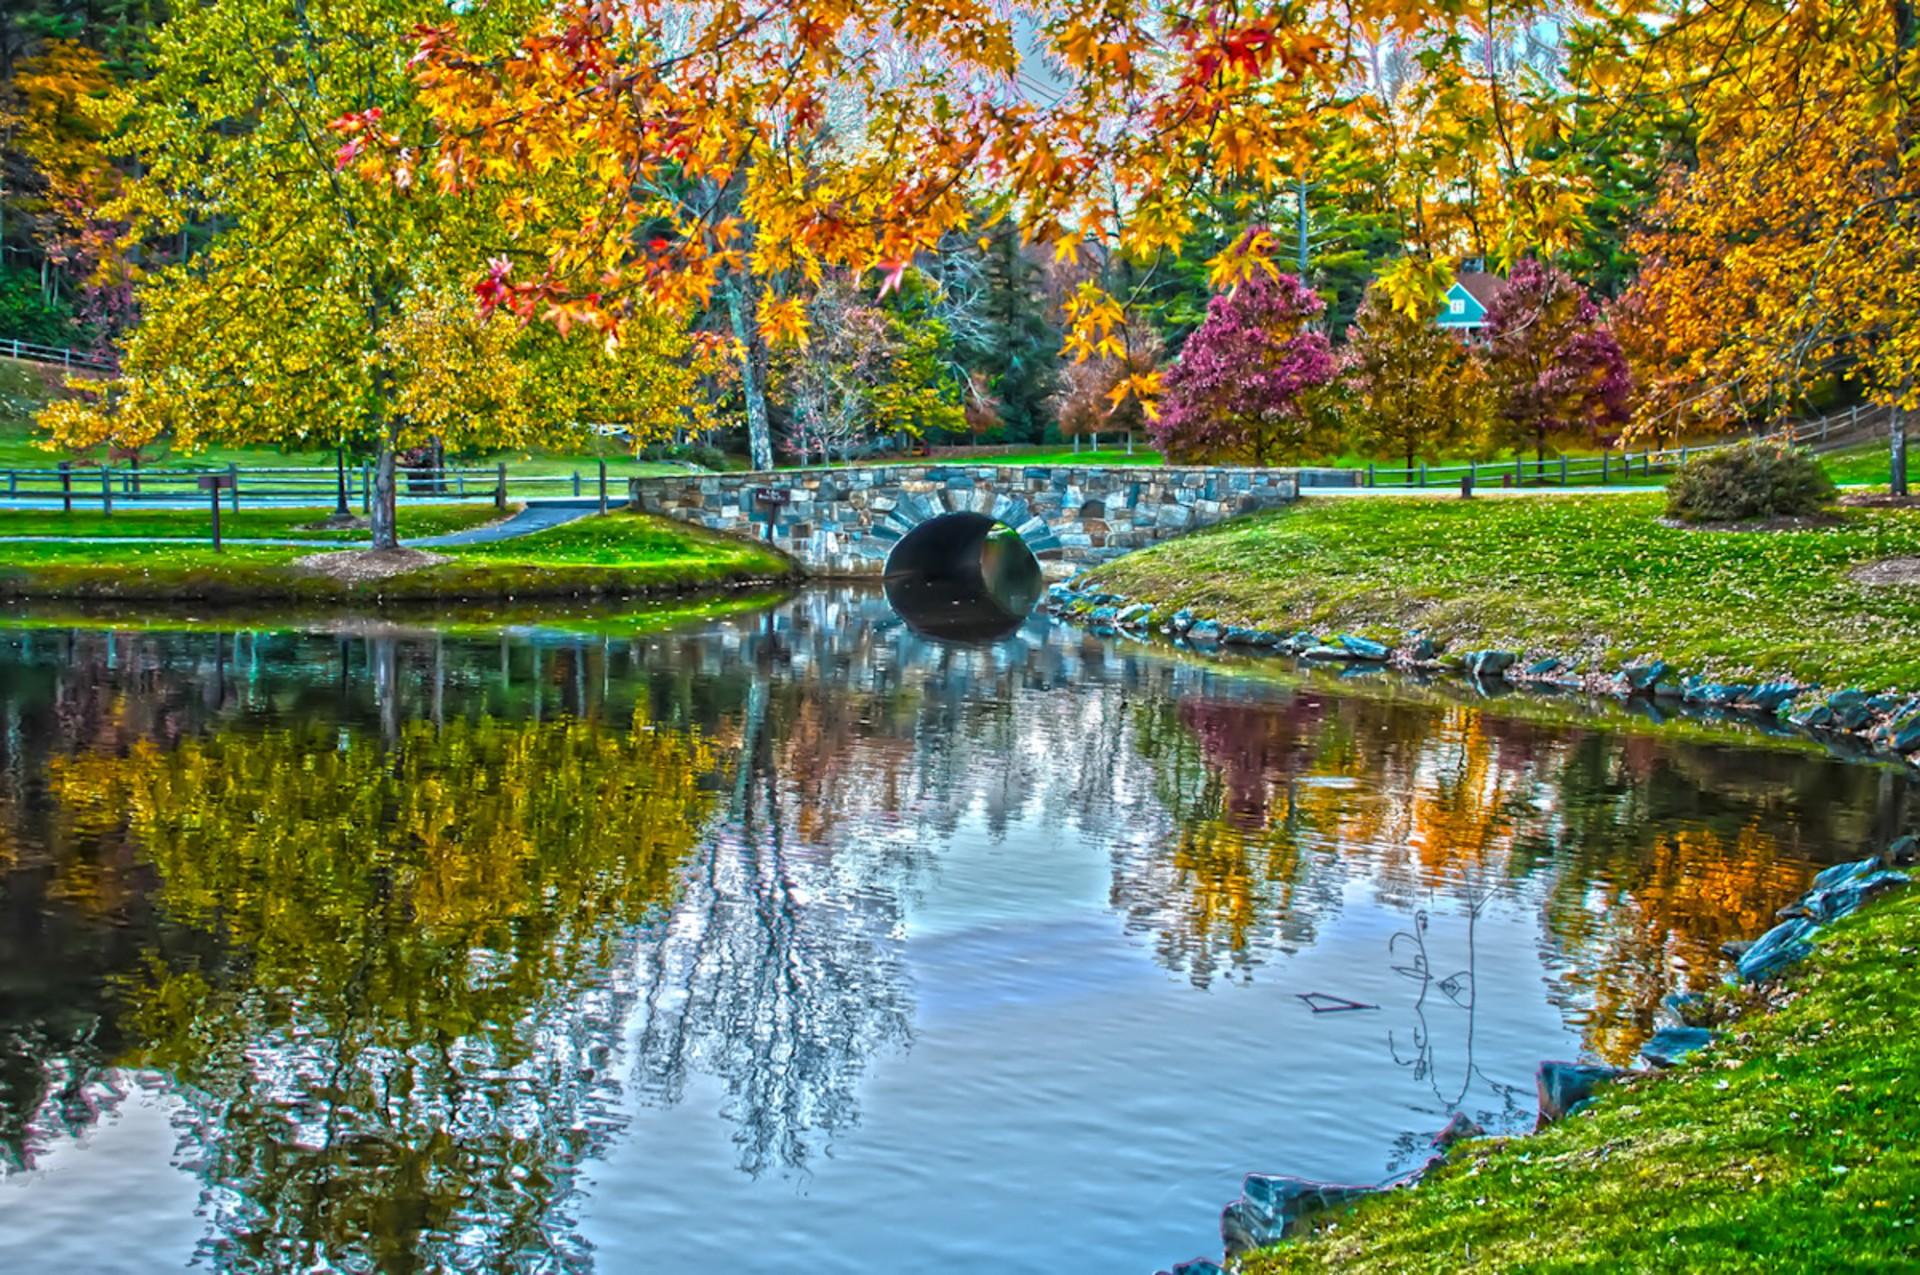 Fall Season Desktop Wallpaper Autumn Lake Reflections Free Stock Photo Public Domain